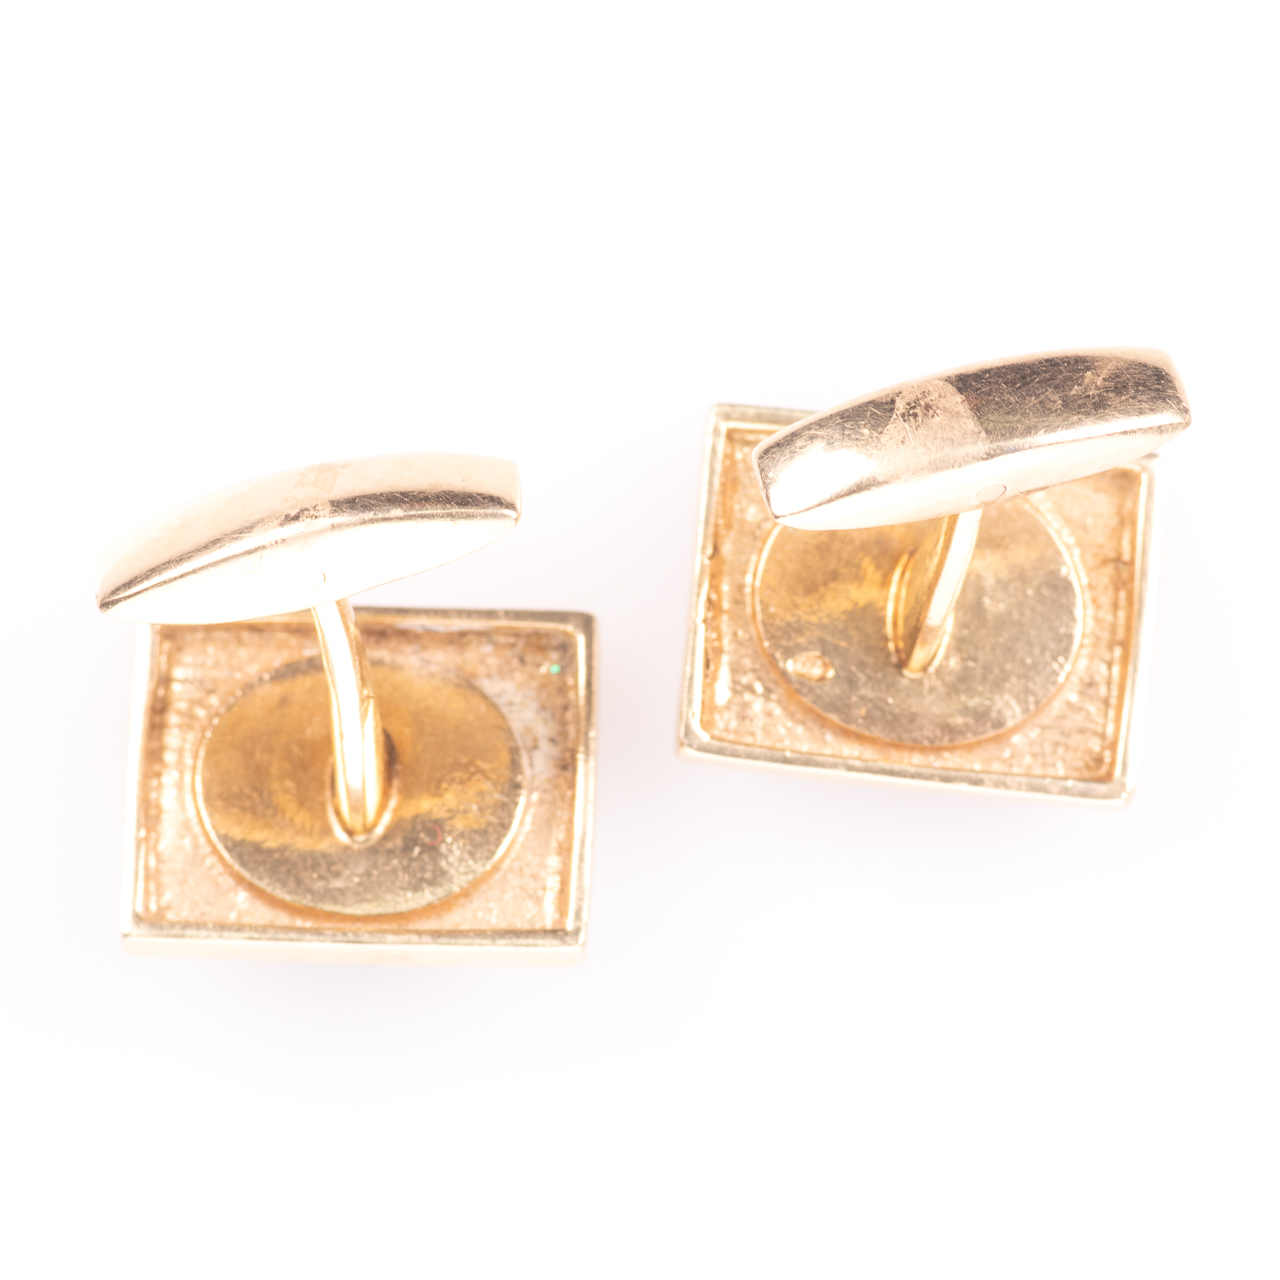 14ct Gold Gentleman's Black Lightning Opal Cufflinks - Image 4 of 6